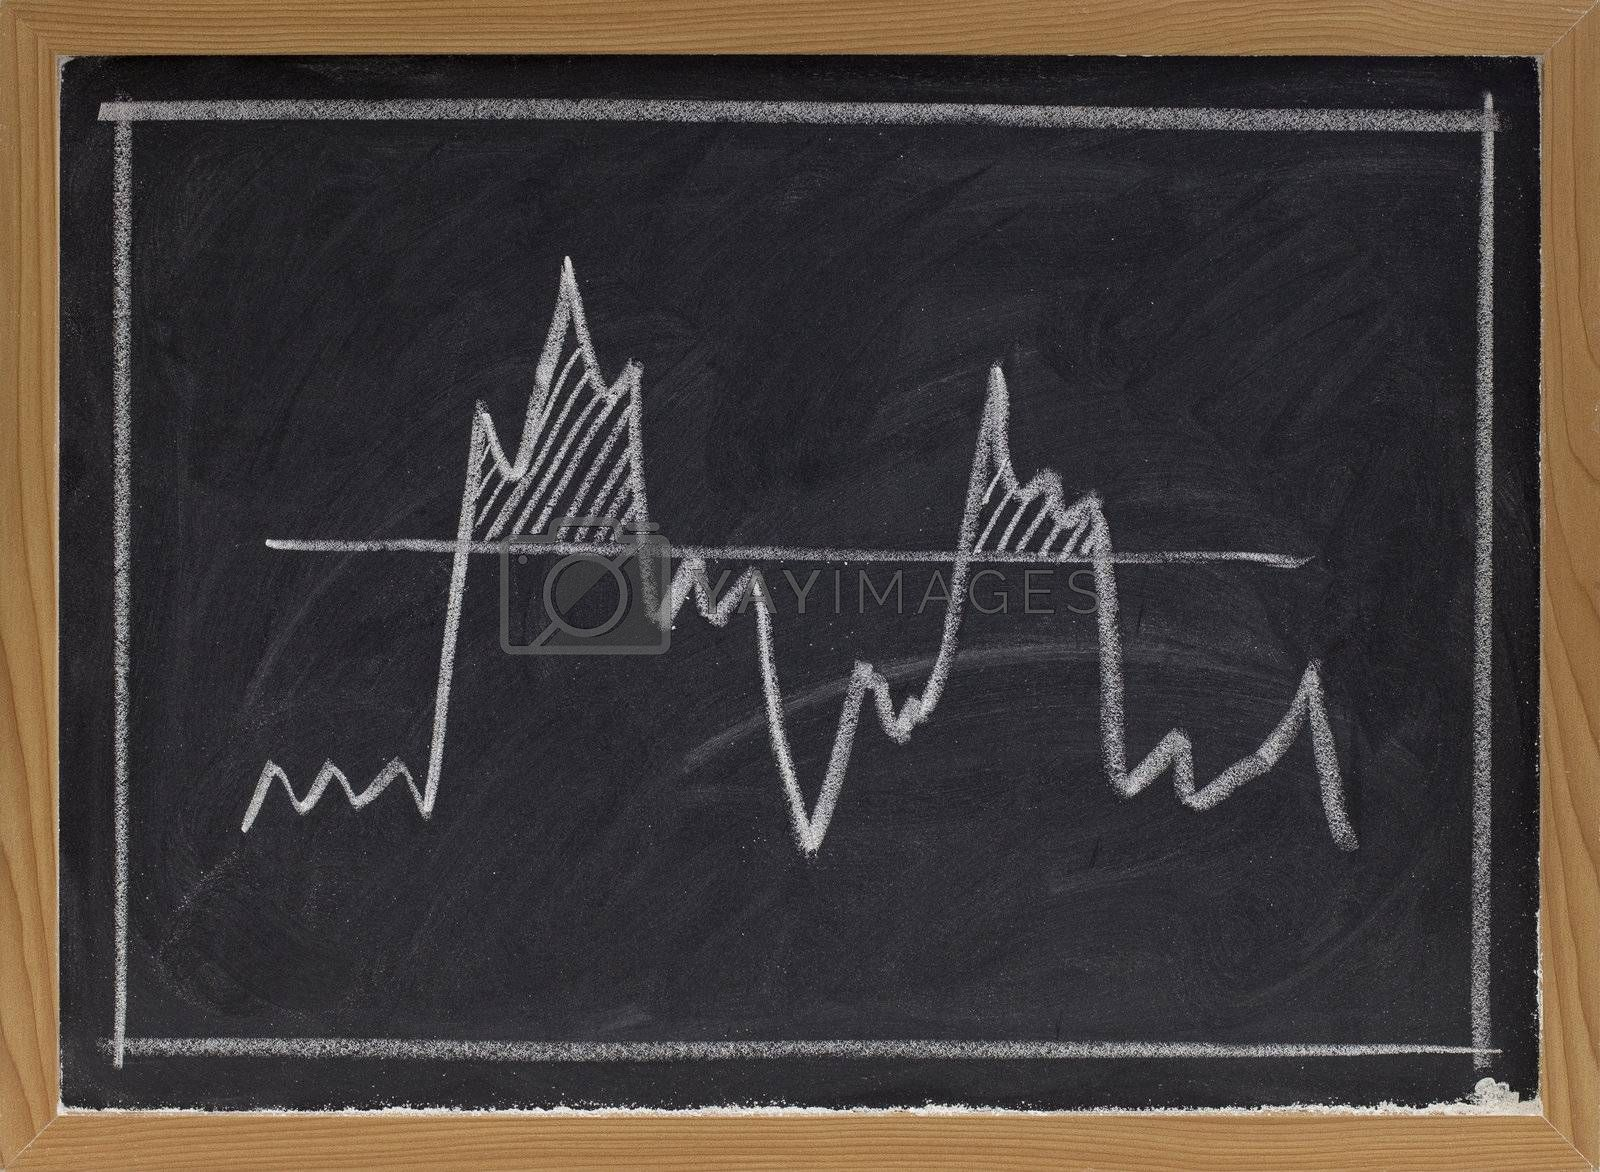 threshold concept on blackboard by PixelsAway